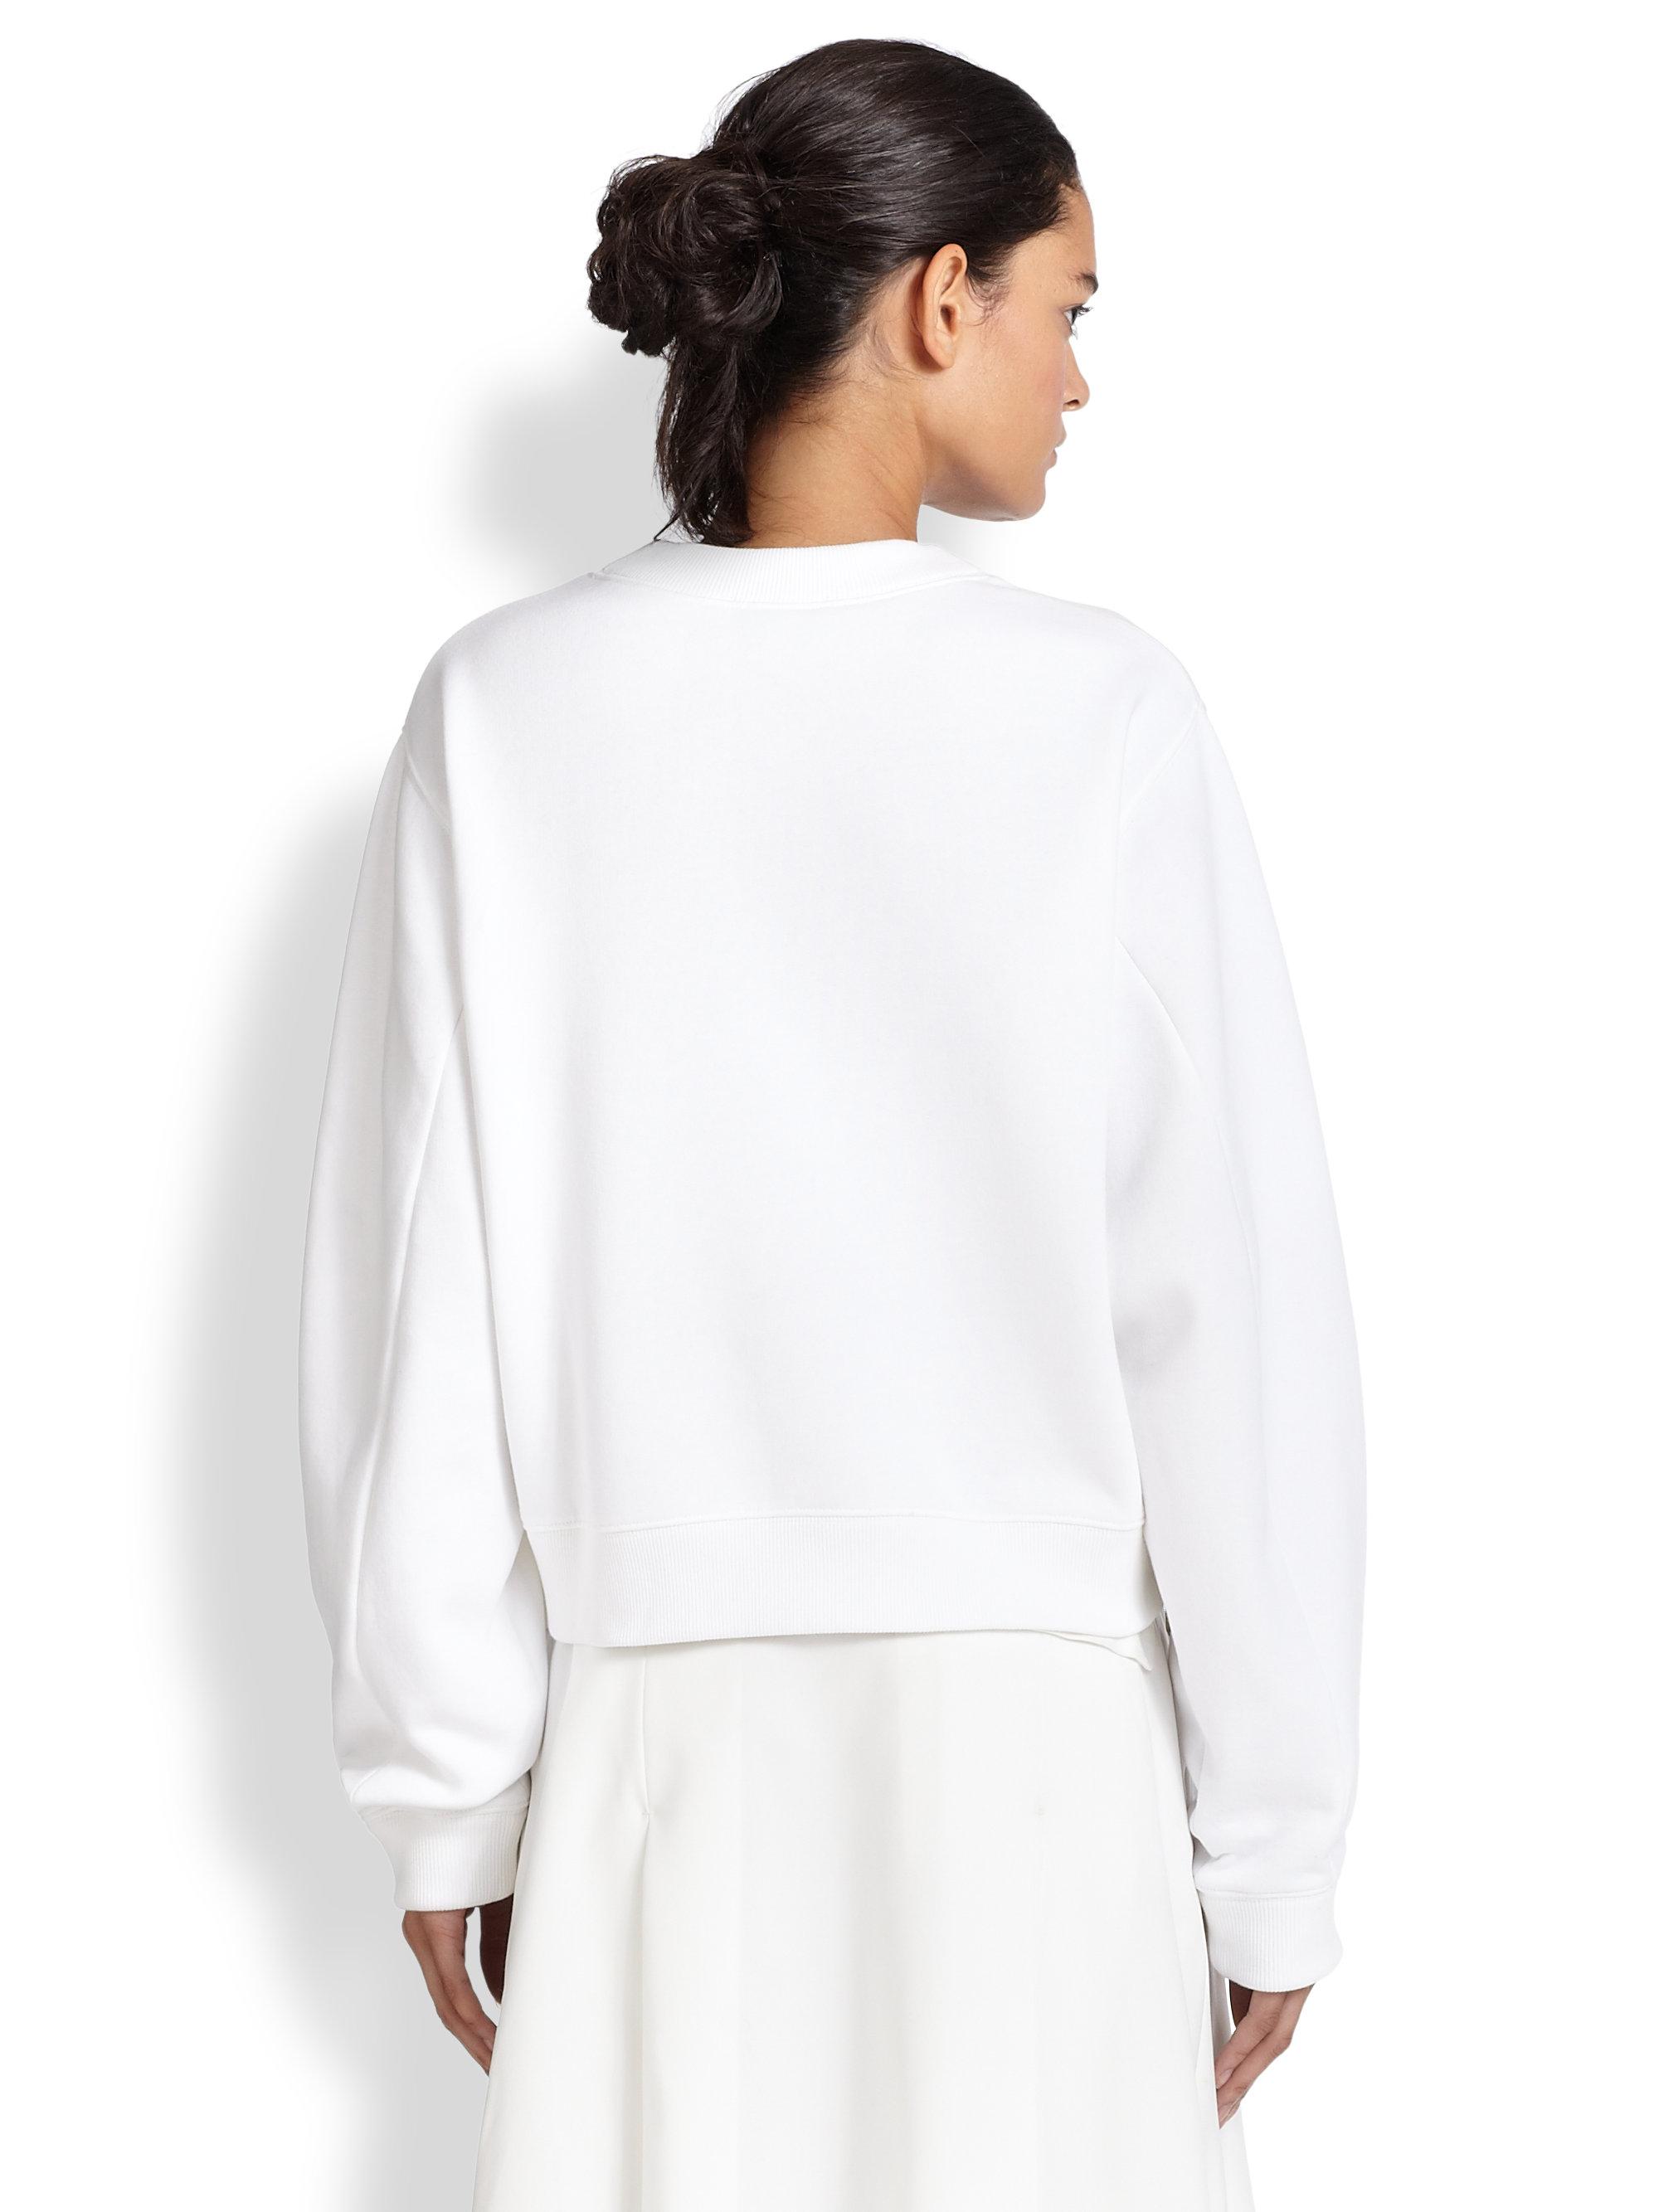 Acne studios Bird Fleece Sweater in White | Lyst